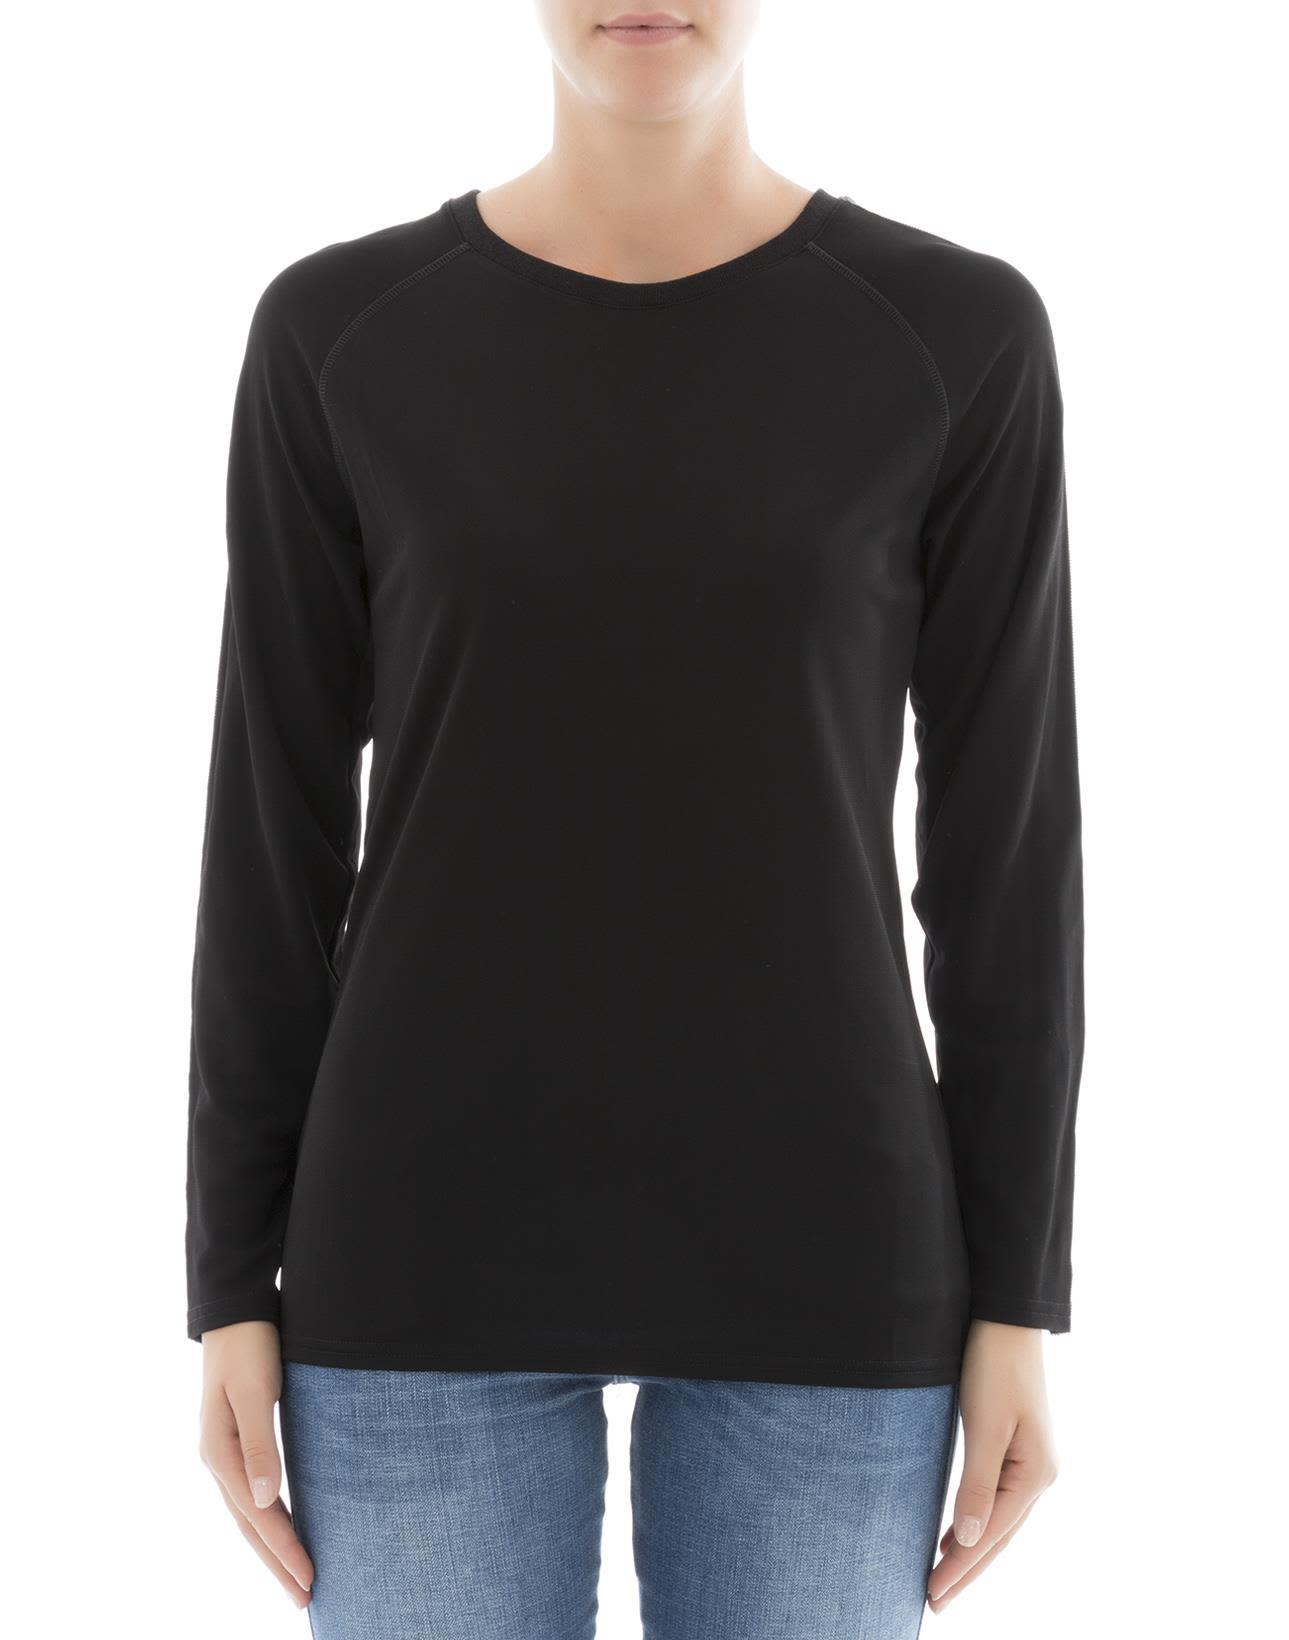 Black Viscose Sweatshirt